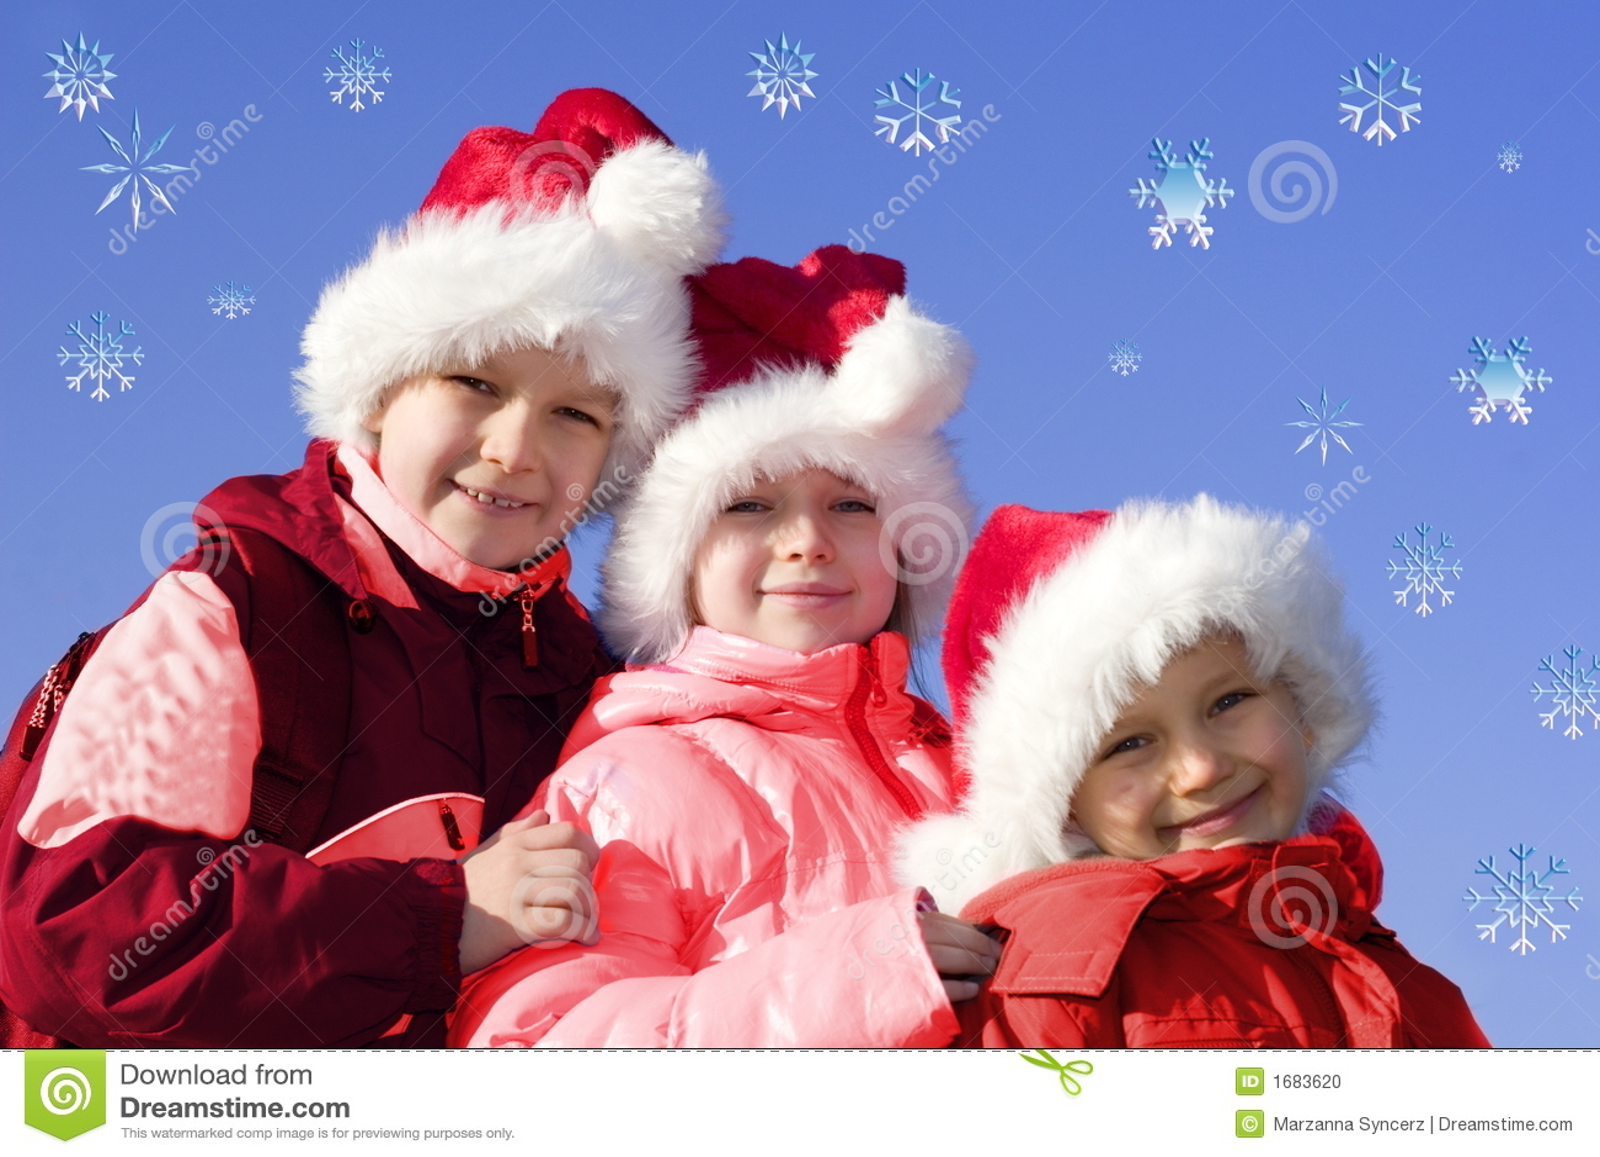 Kids playing santa claus stock photo image of children